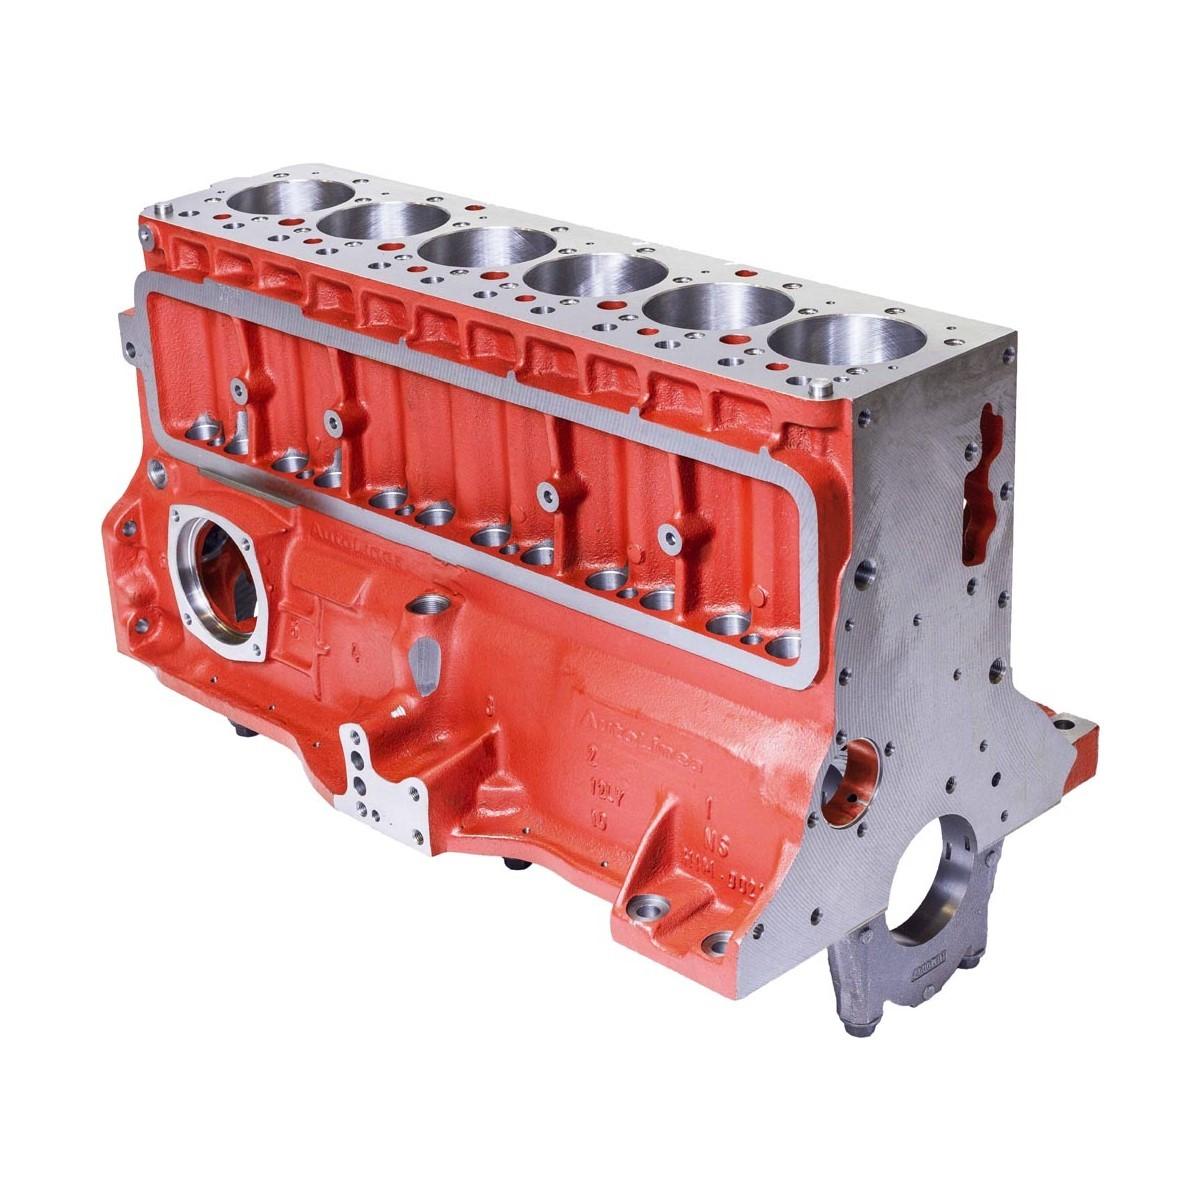 Bloco Motor MB 1113 1313 1513 1516 2013 2016 2216 Om352 352a